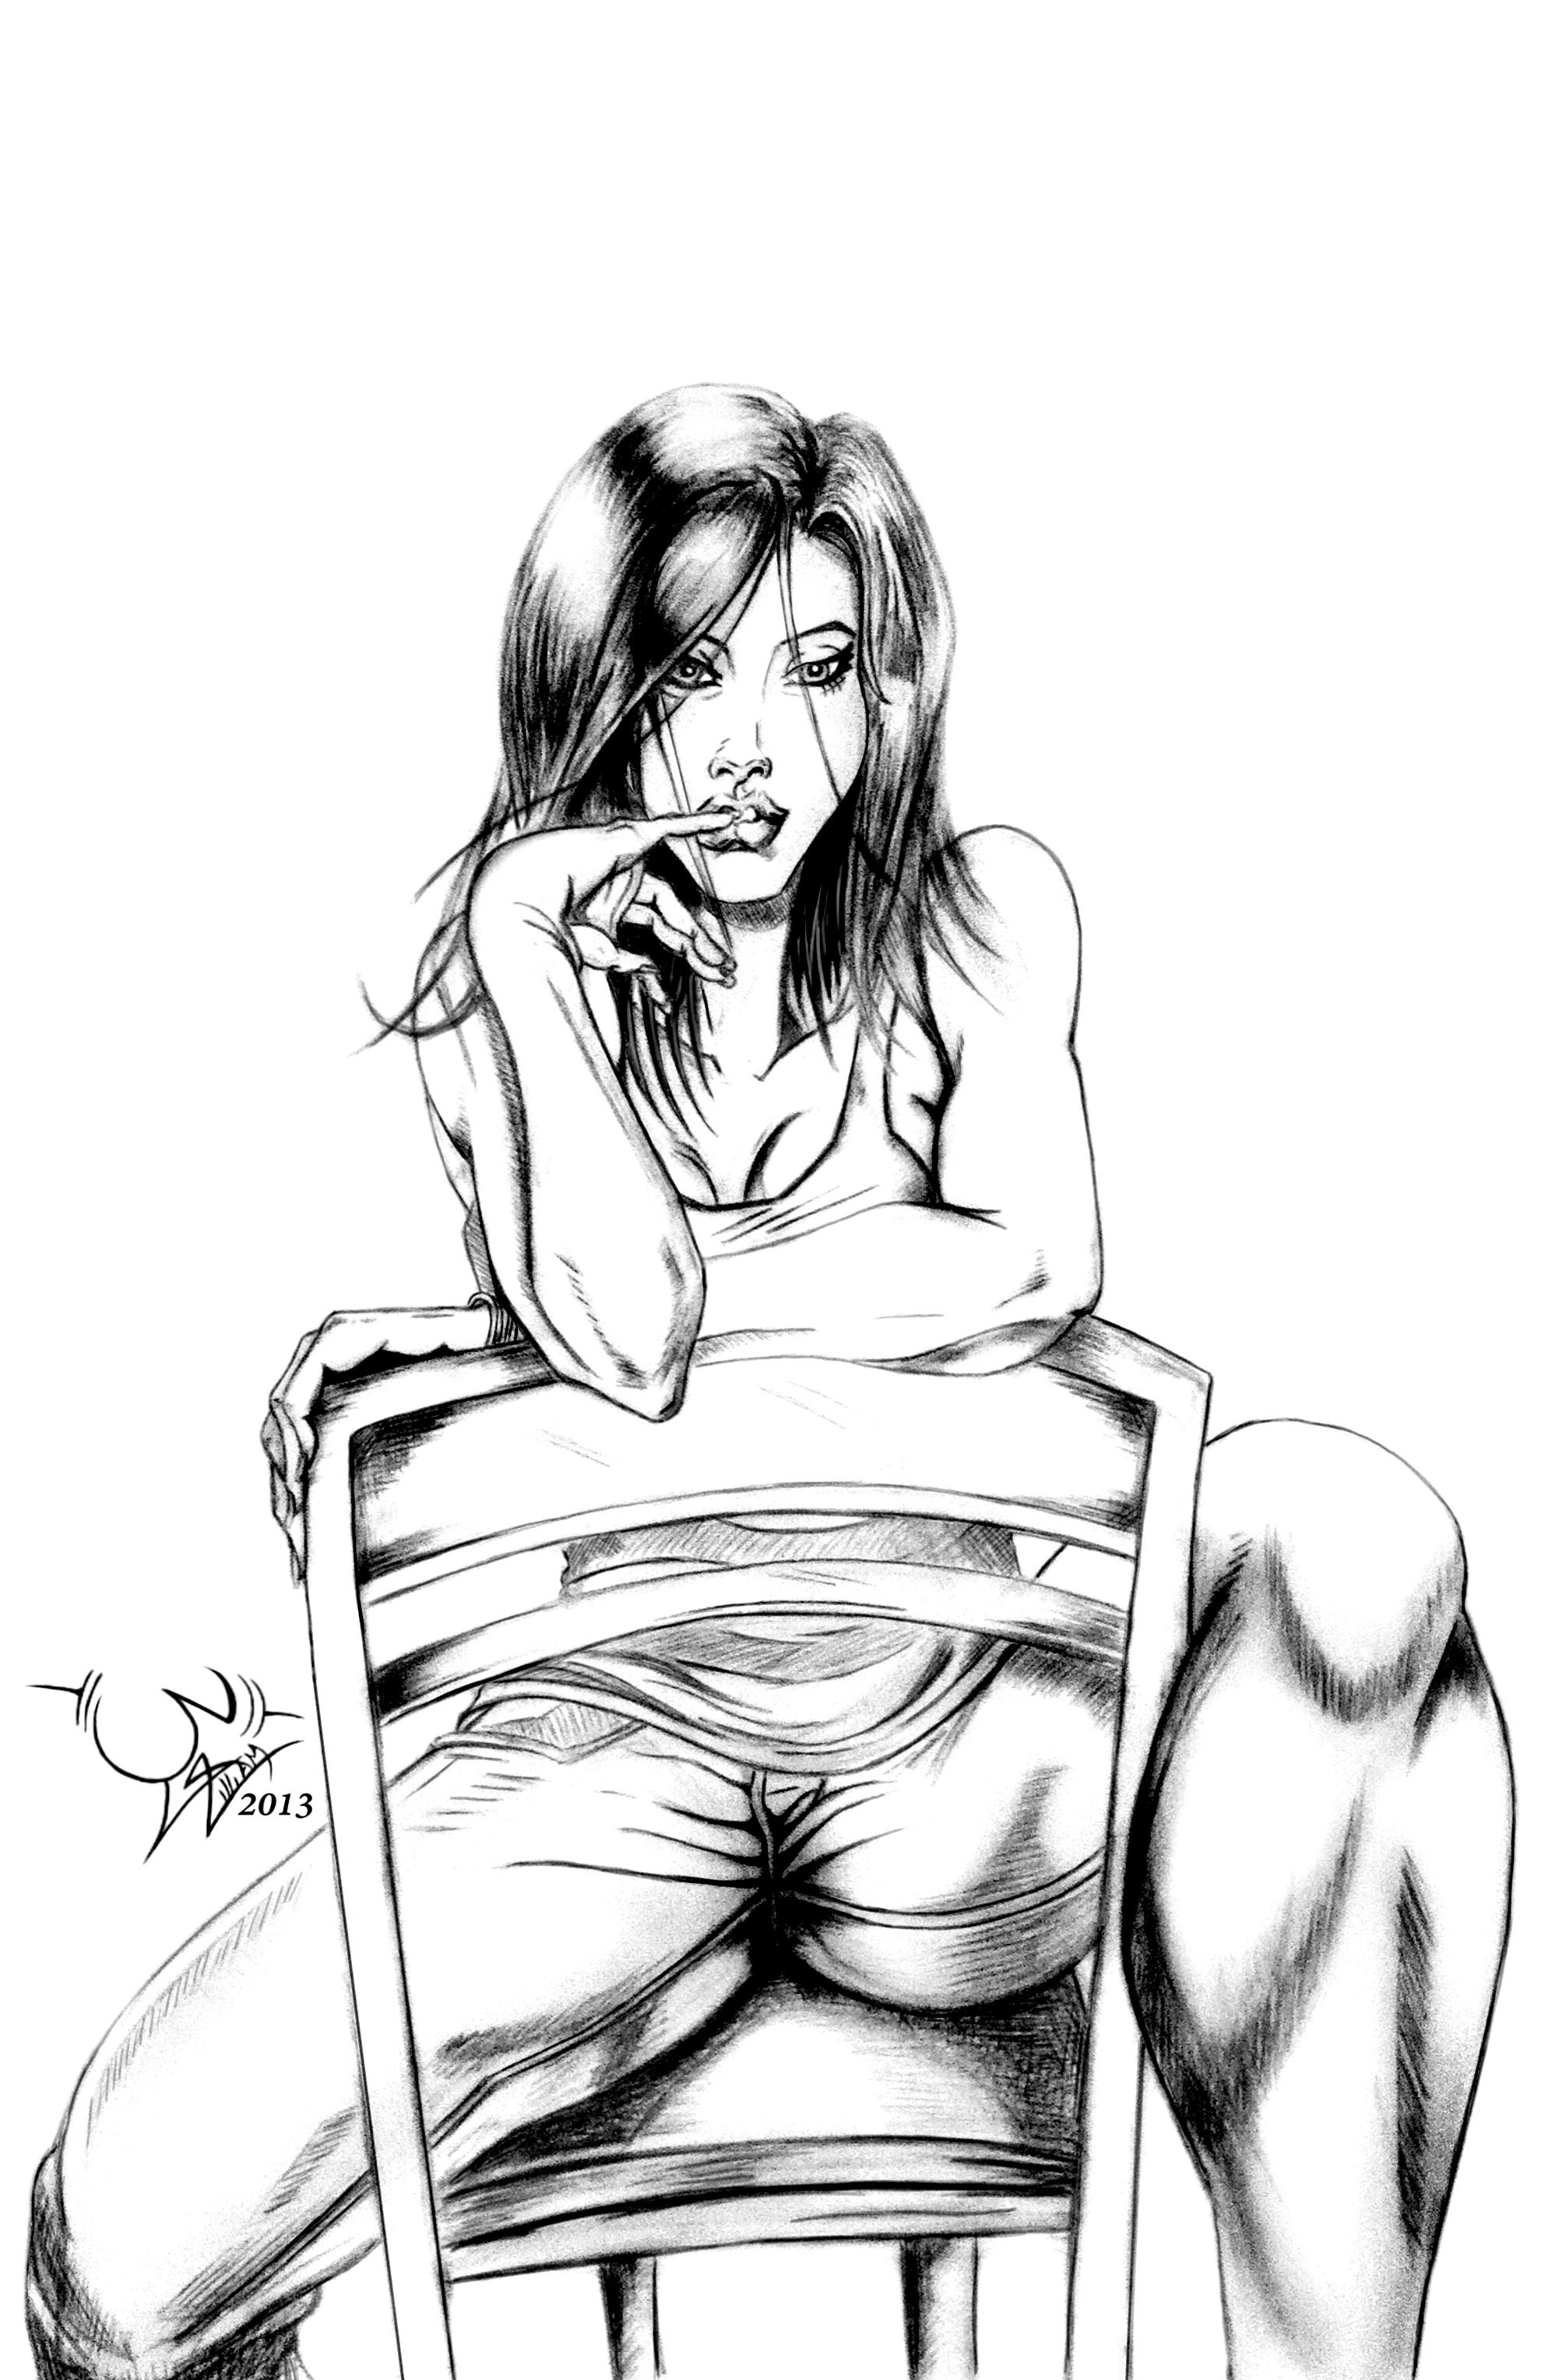 Art Room Drawing: Pencil Interrogation Room By Artwbig By Artwbig On DeviantArt